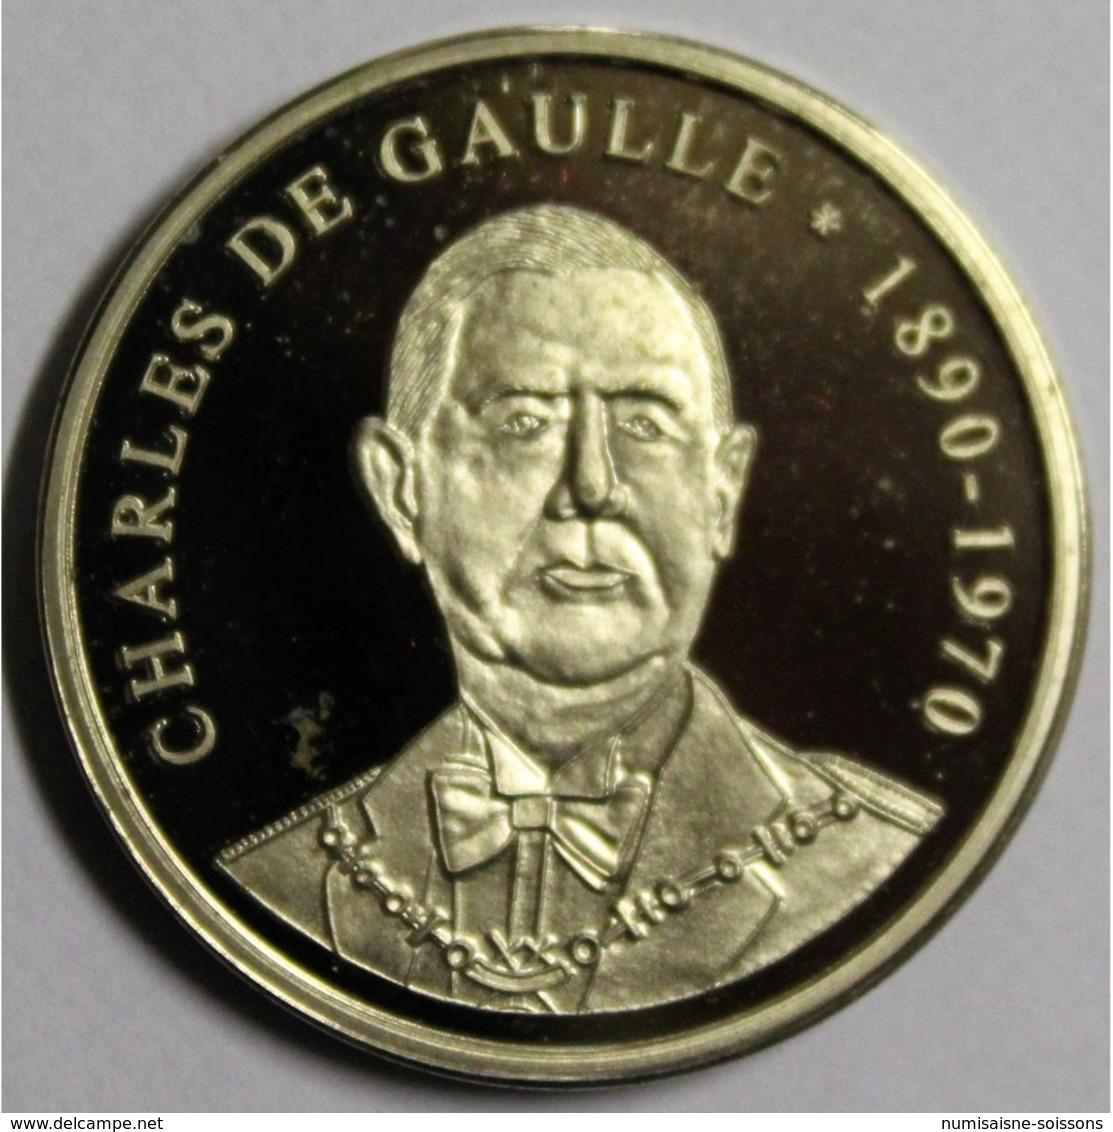 MEDAILLE - LES PRESIDENTS FRANCAIS - CHARLES DE GAULLE - 1890-1970 - BE - France